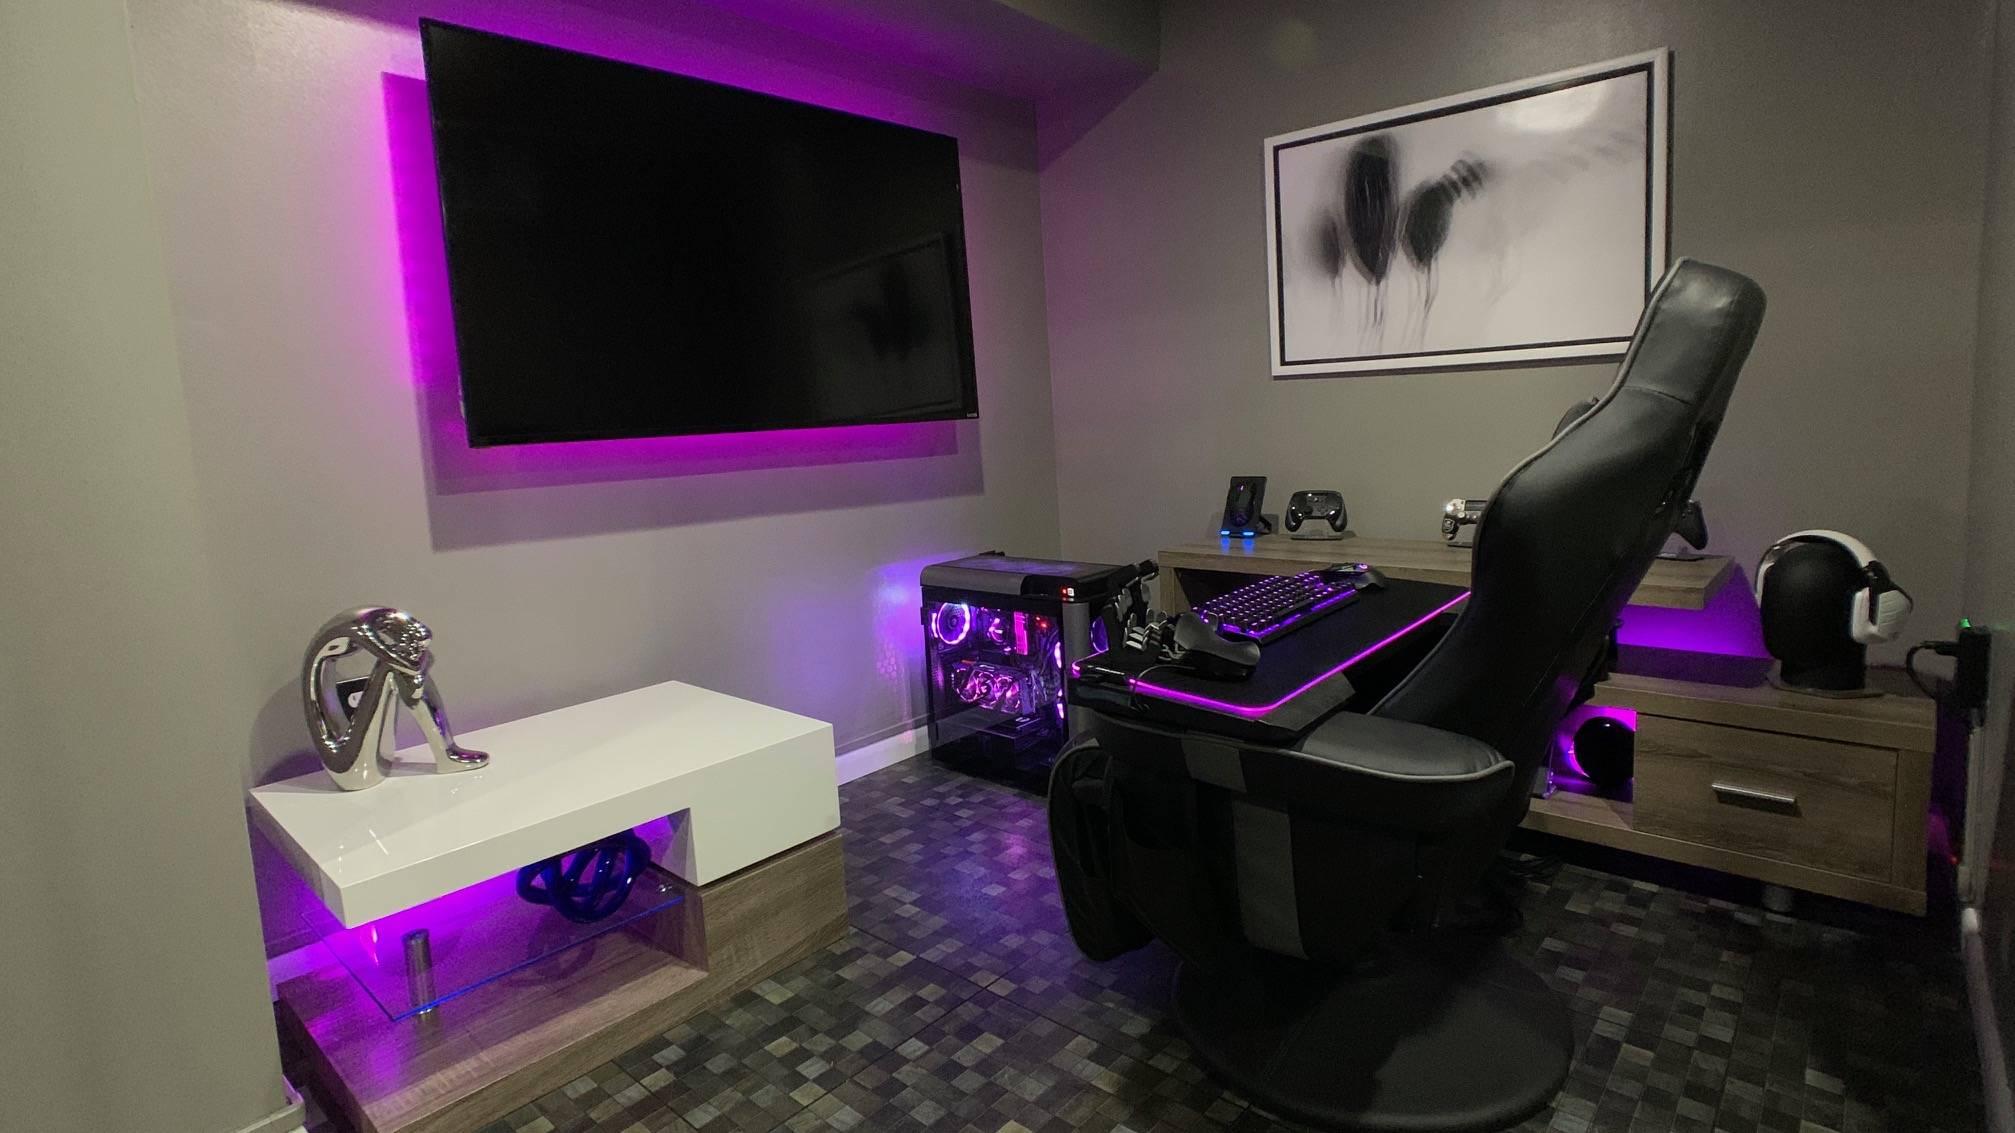 edgaroganesyan's Setup - Bekrah's Ultimate Couch Gaming Setup | Scooget